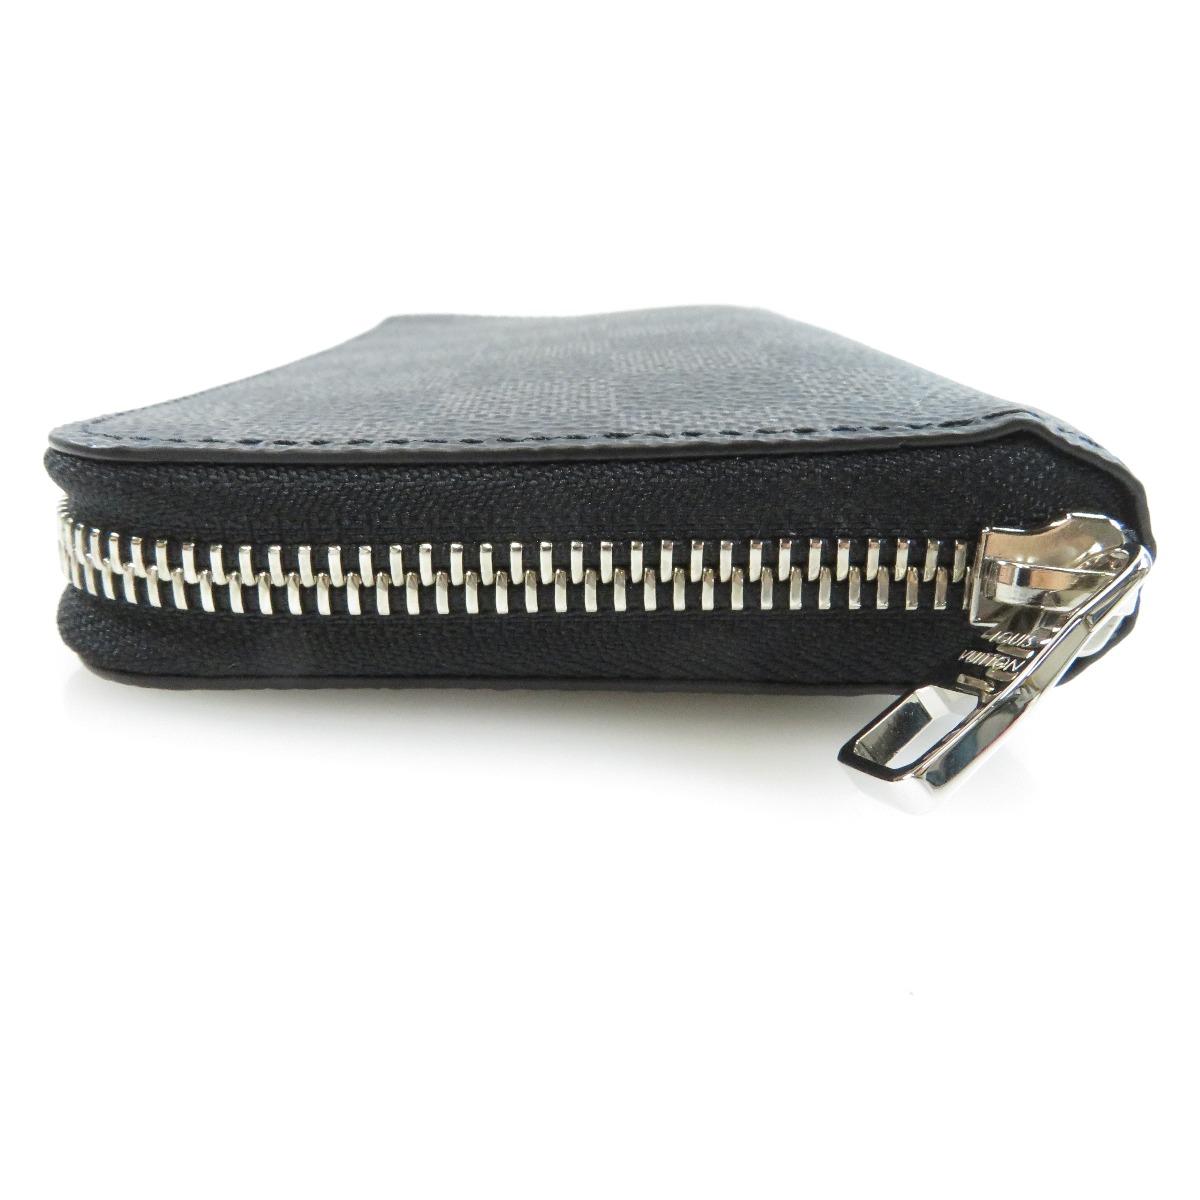 LOUIS VUITTON porutofoiyu·Basco N61653长钱包(有硬币袋)damiekyambasumenzu